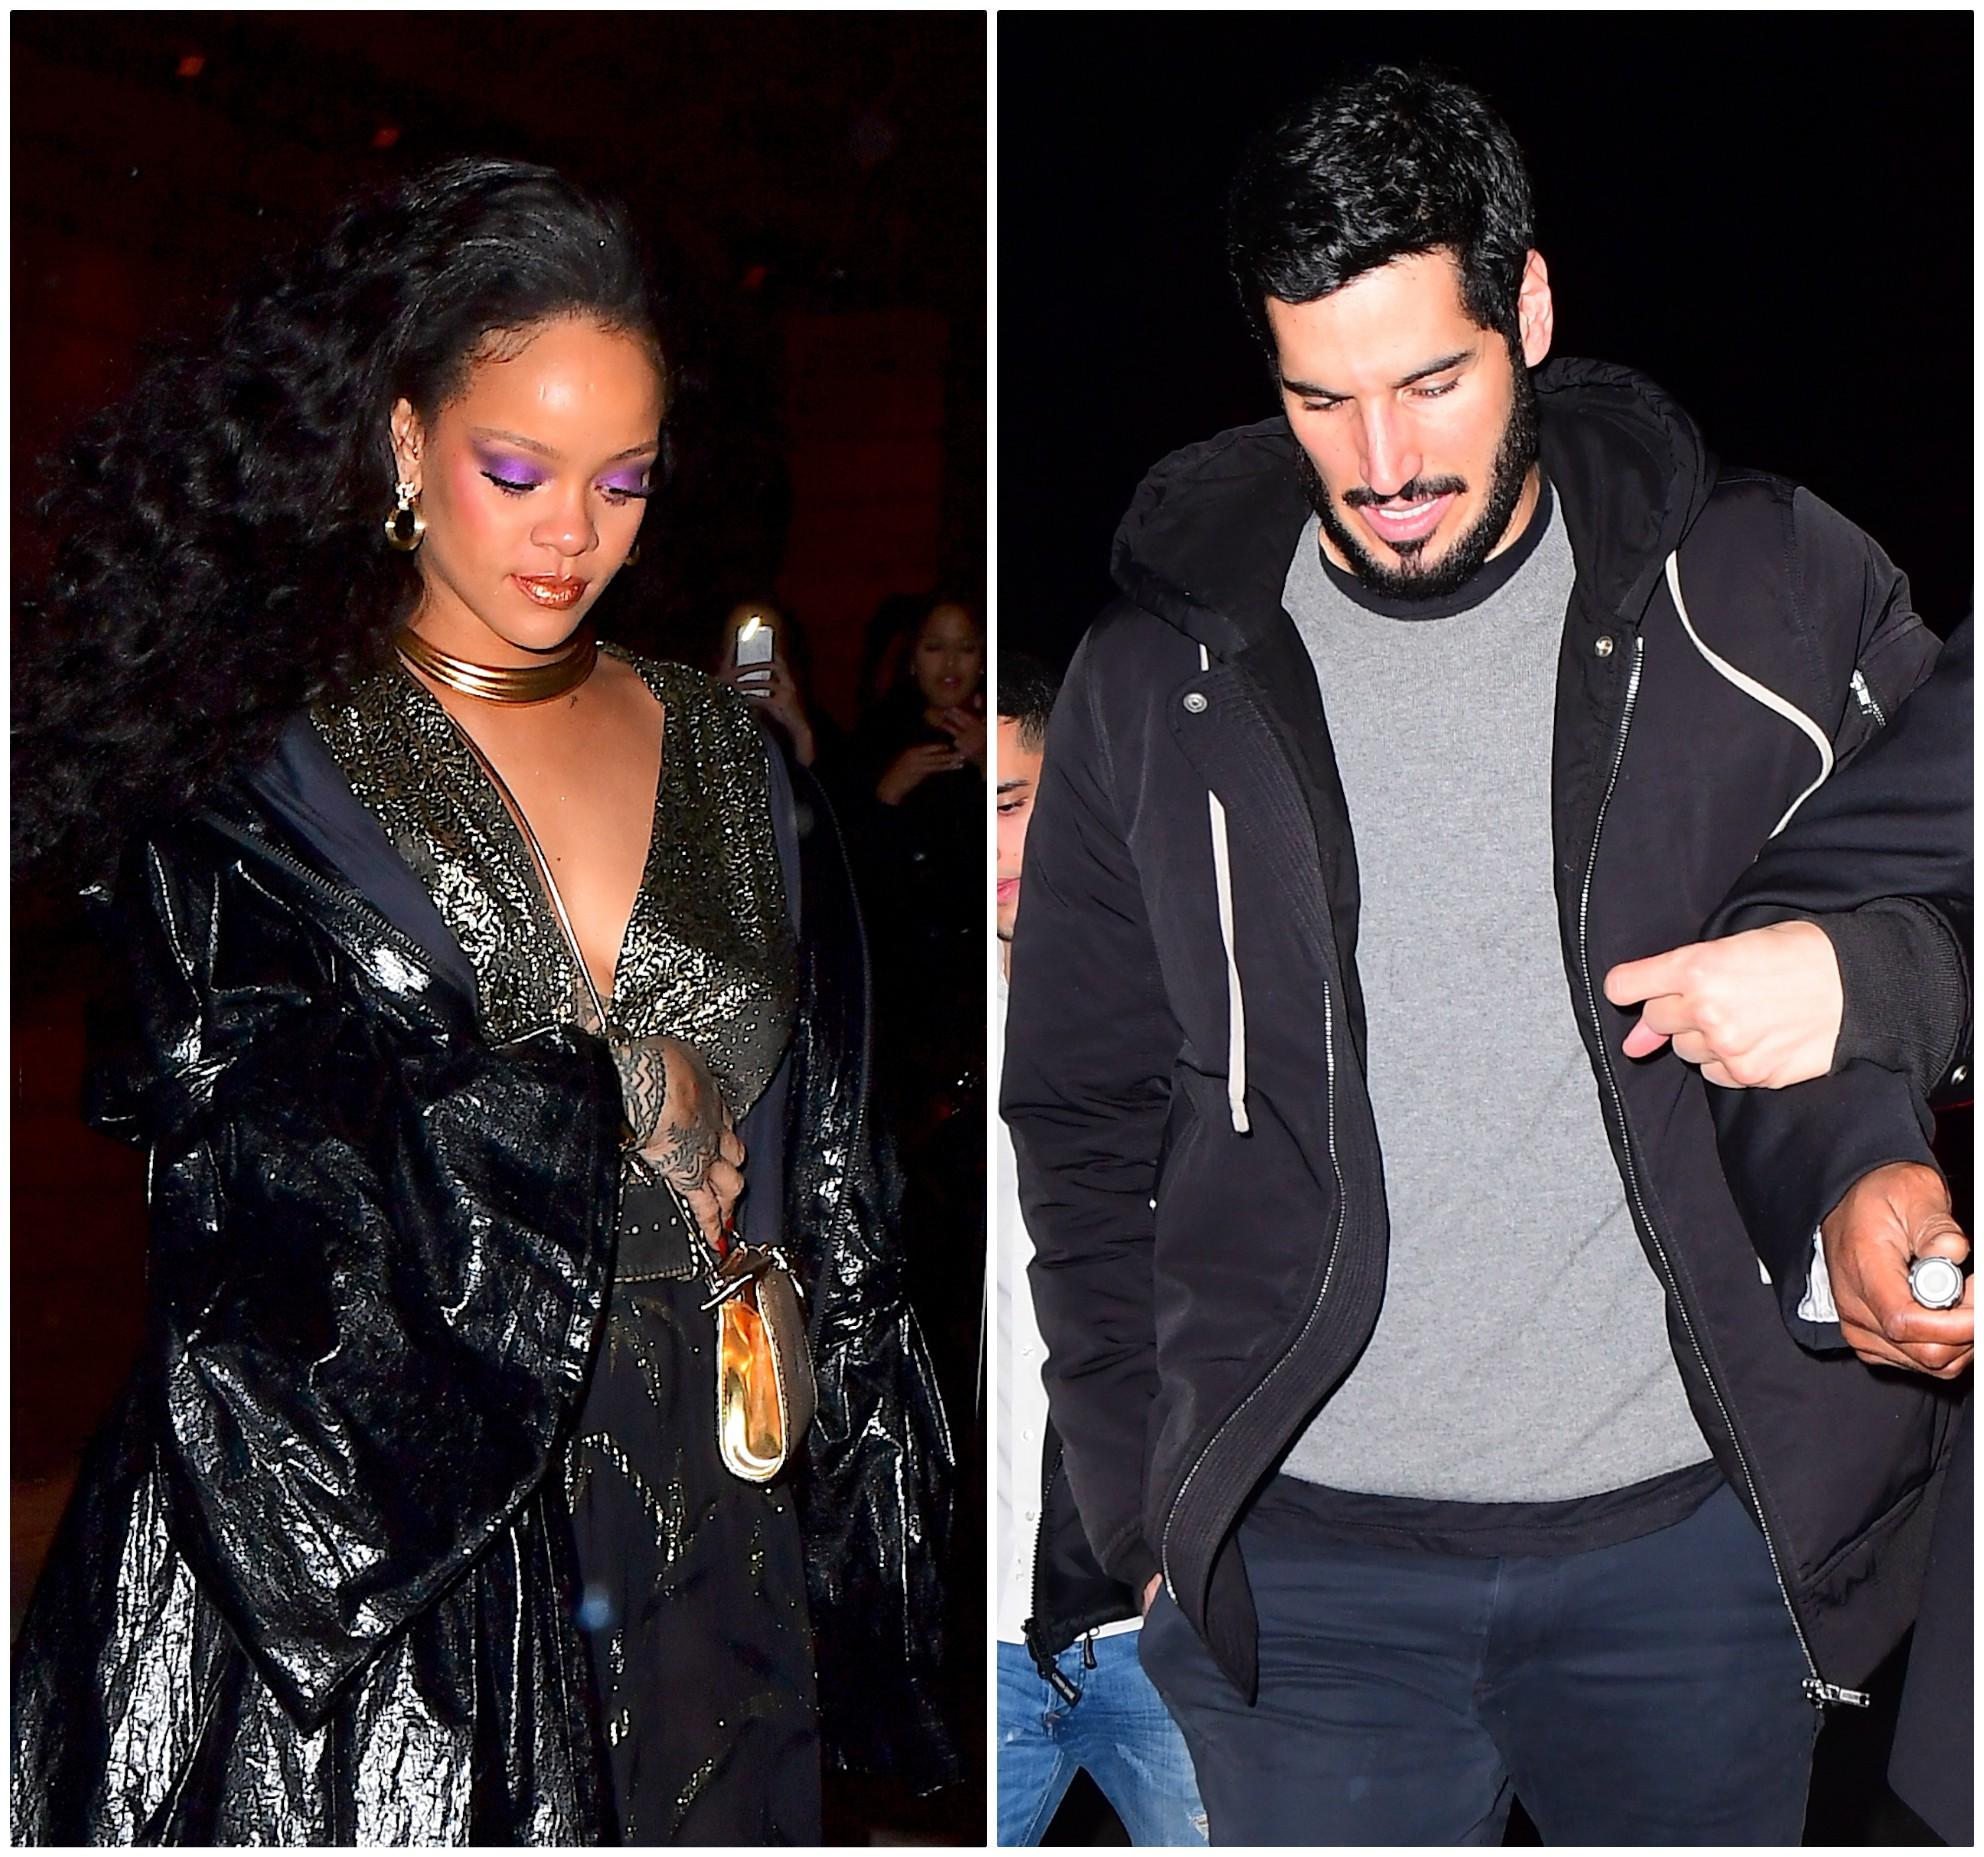 Rihanna and boyfriend Hassan Jameel